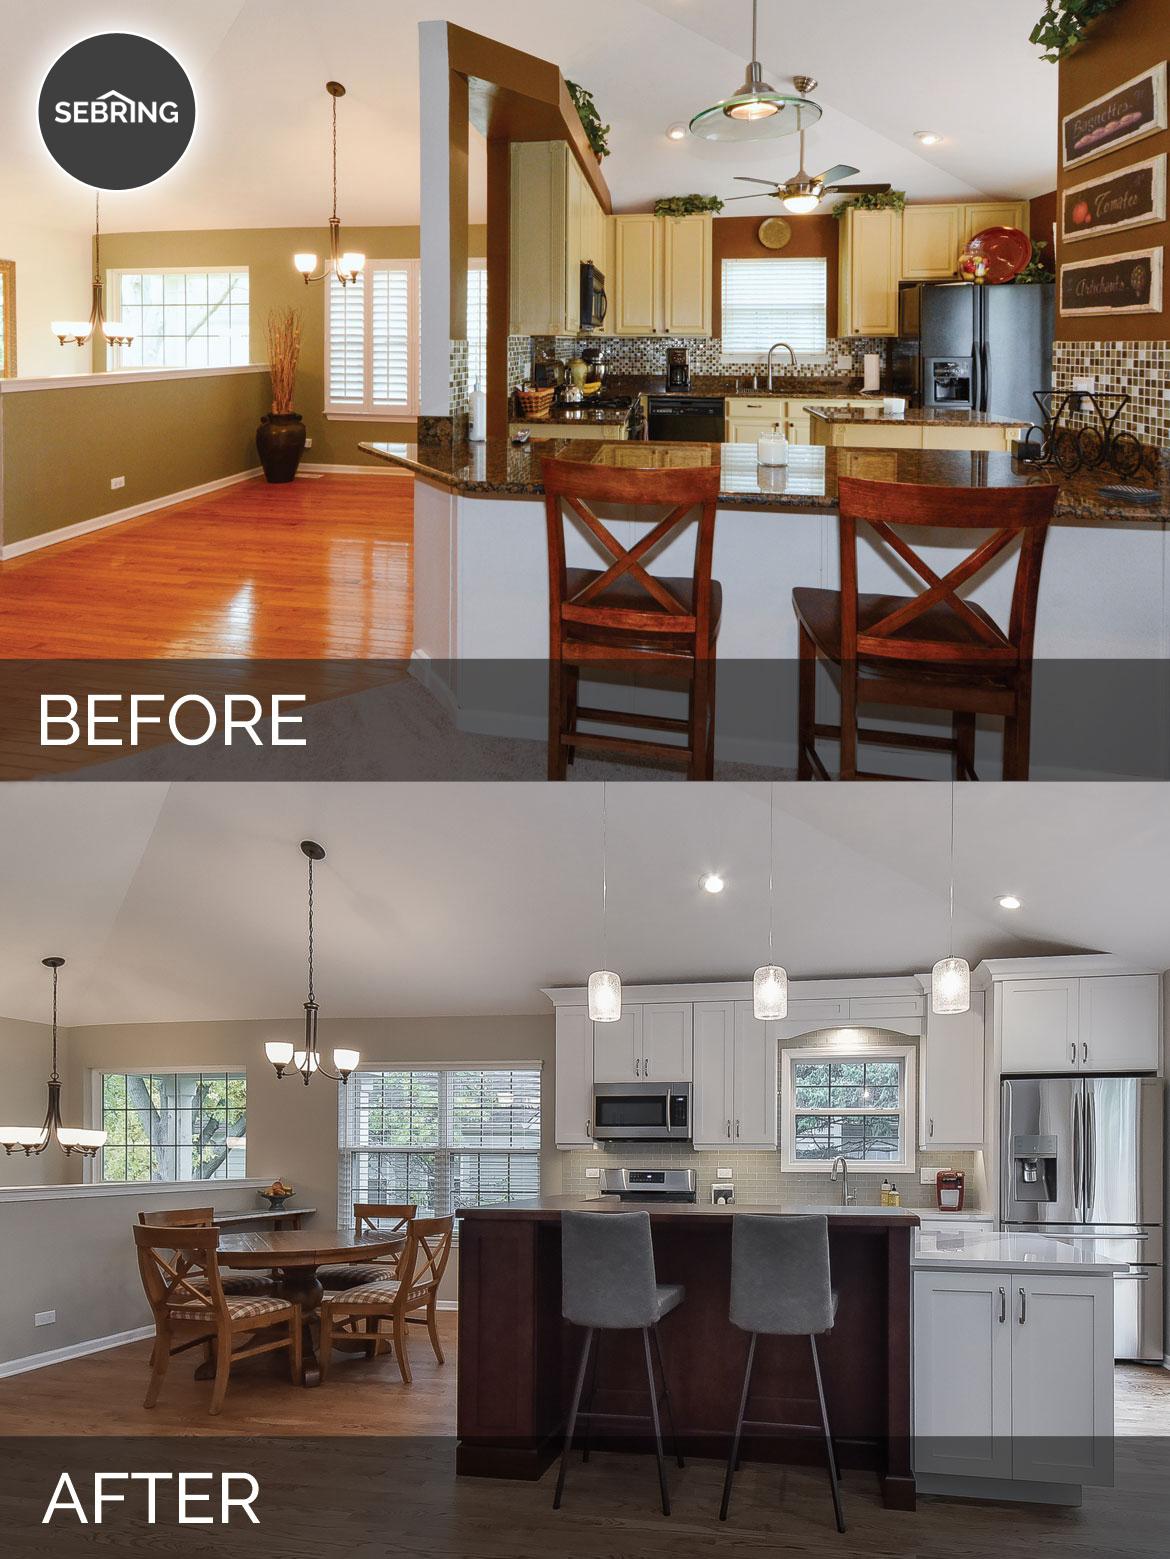 Bill Carol 39 S Kitchen Before After Pictures Home Remodeling Contractors Sebring Design Build